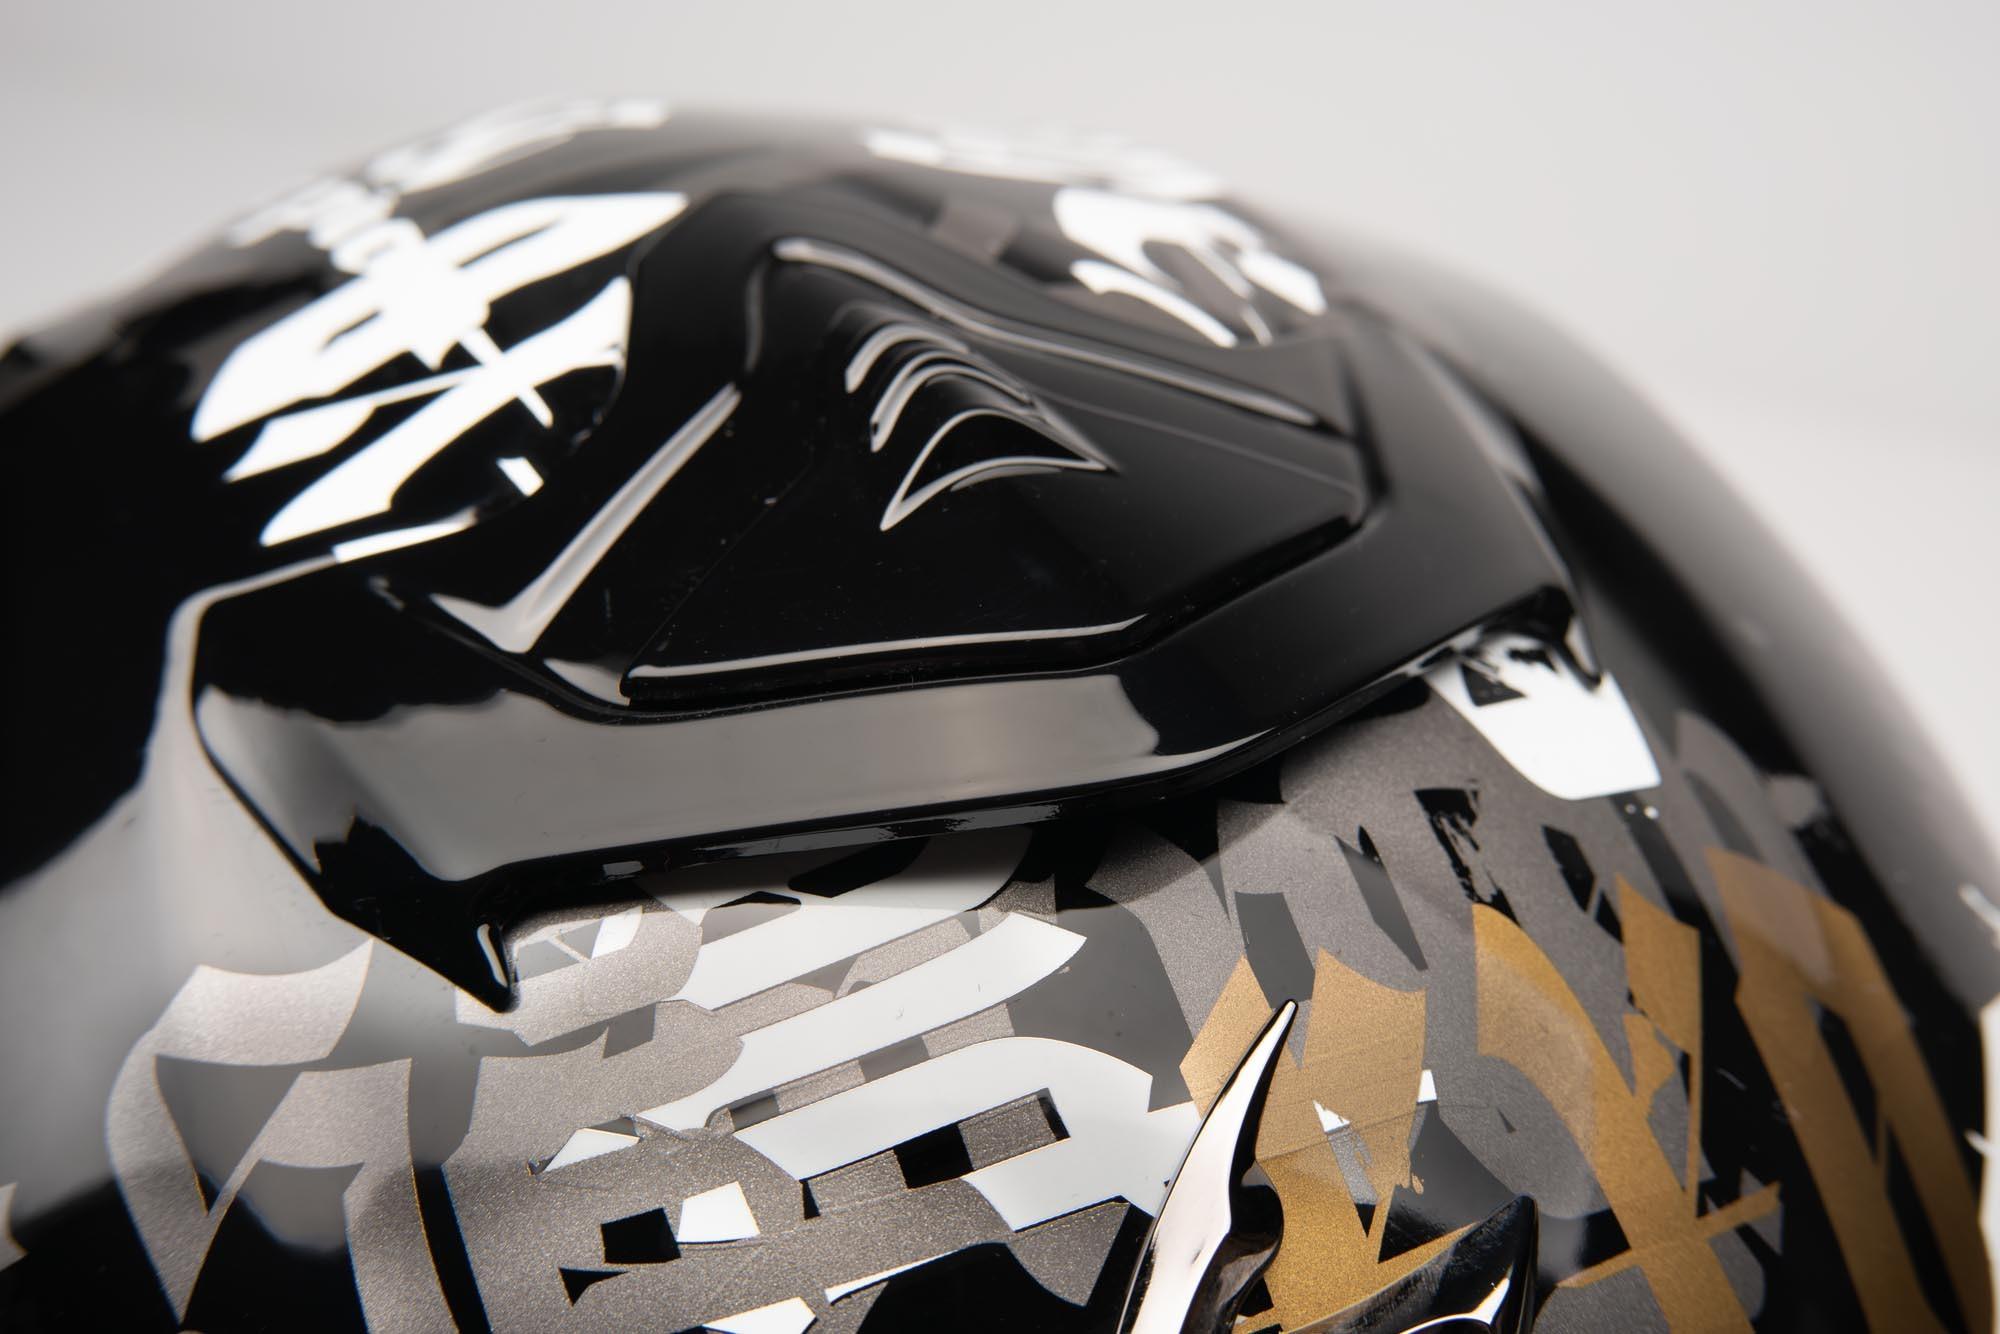 Top vent of the Scorpion EXO R1 helmet